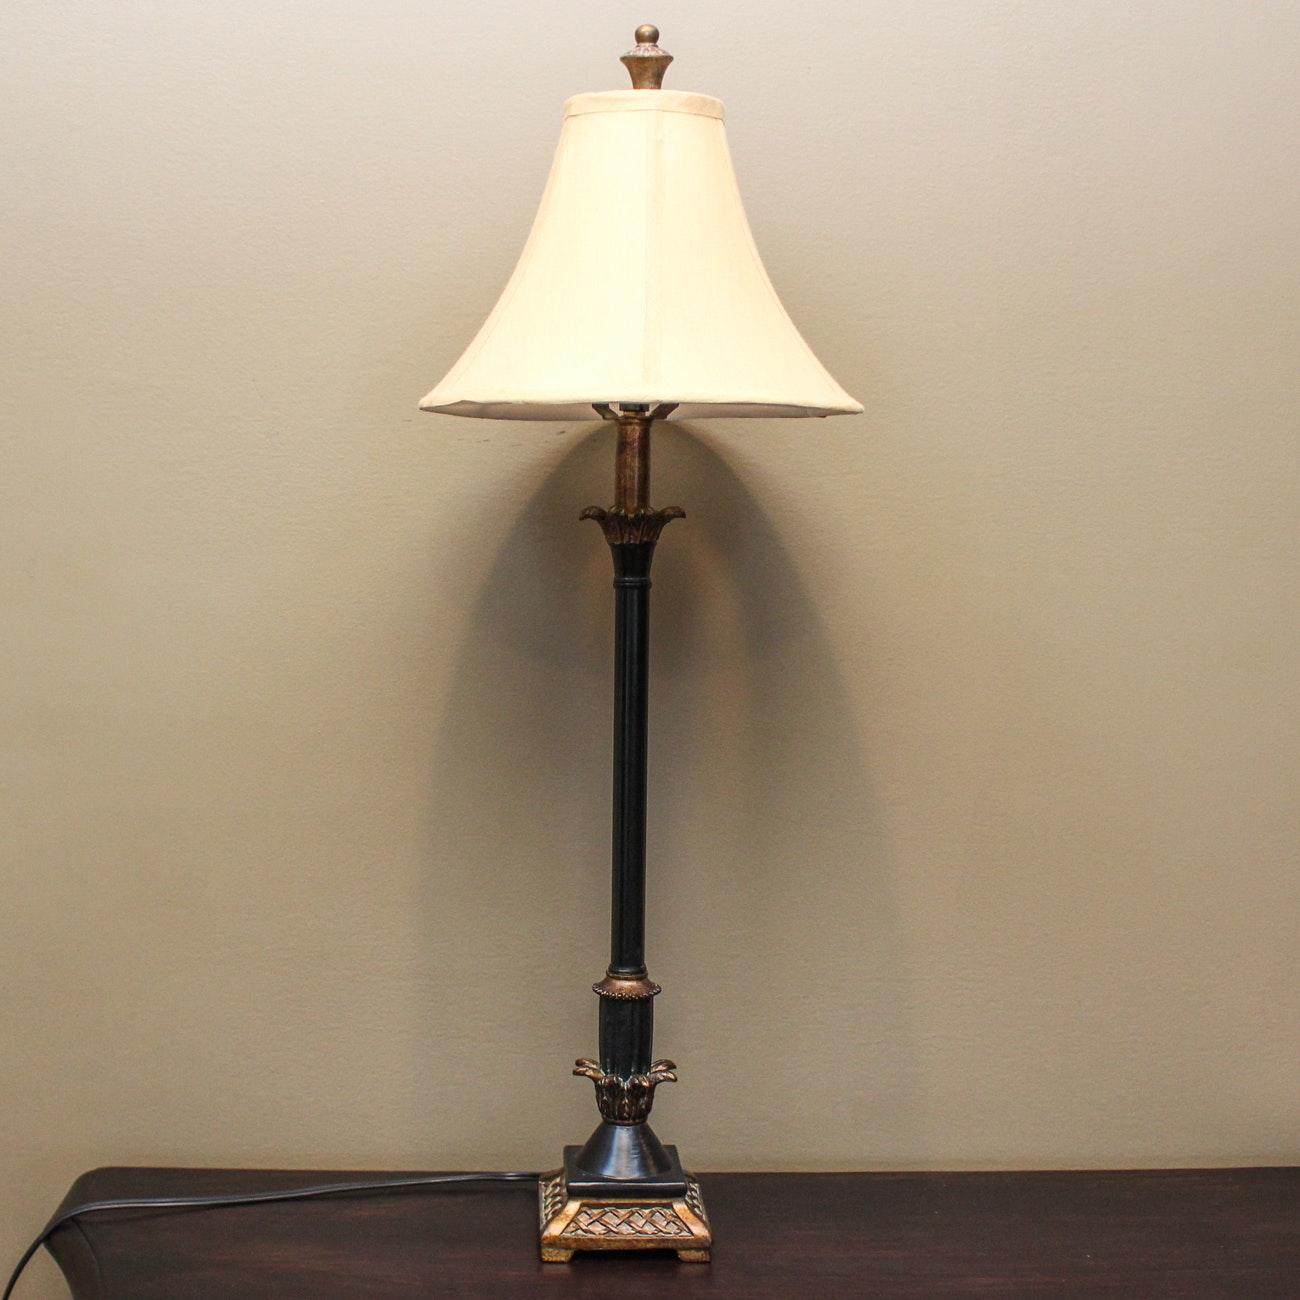 Pair of Slender Table Lamps